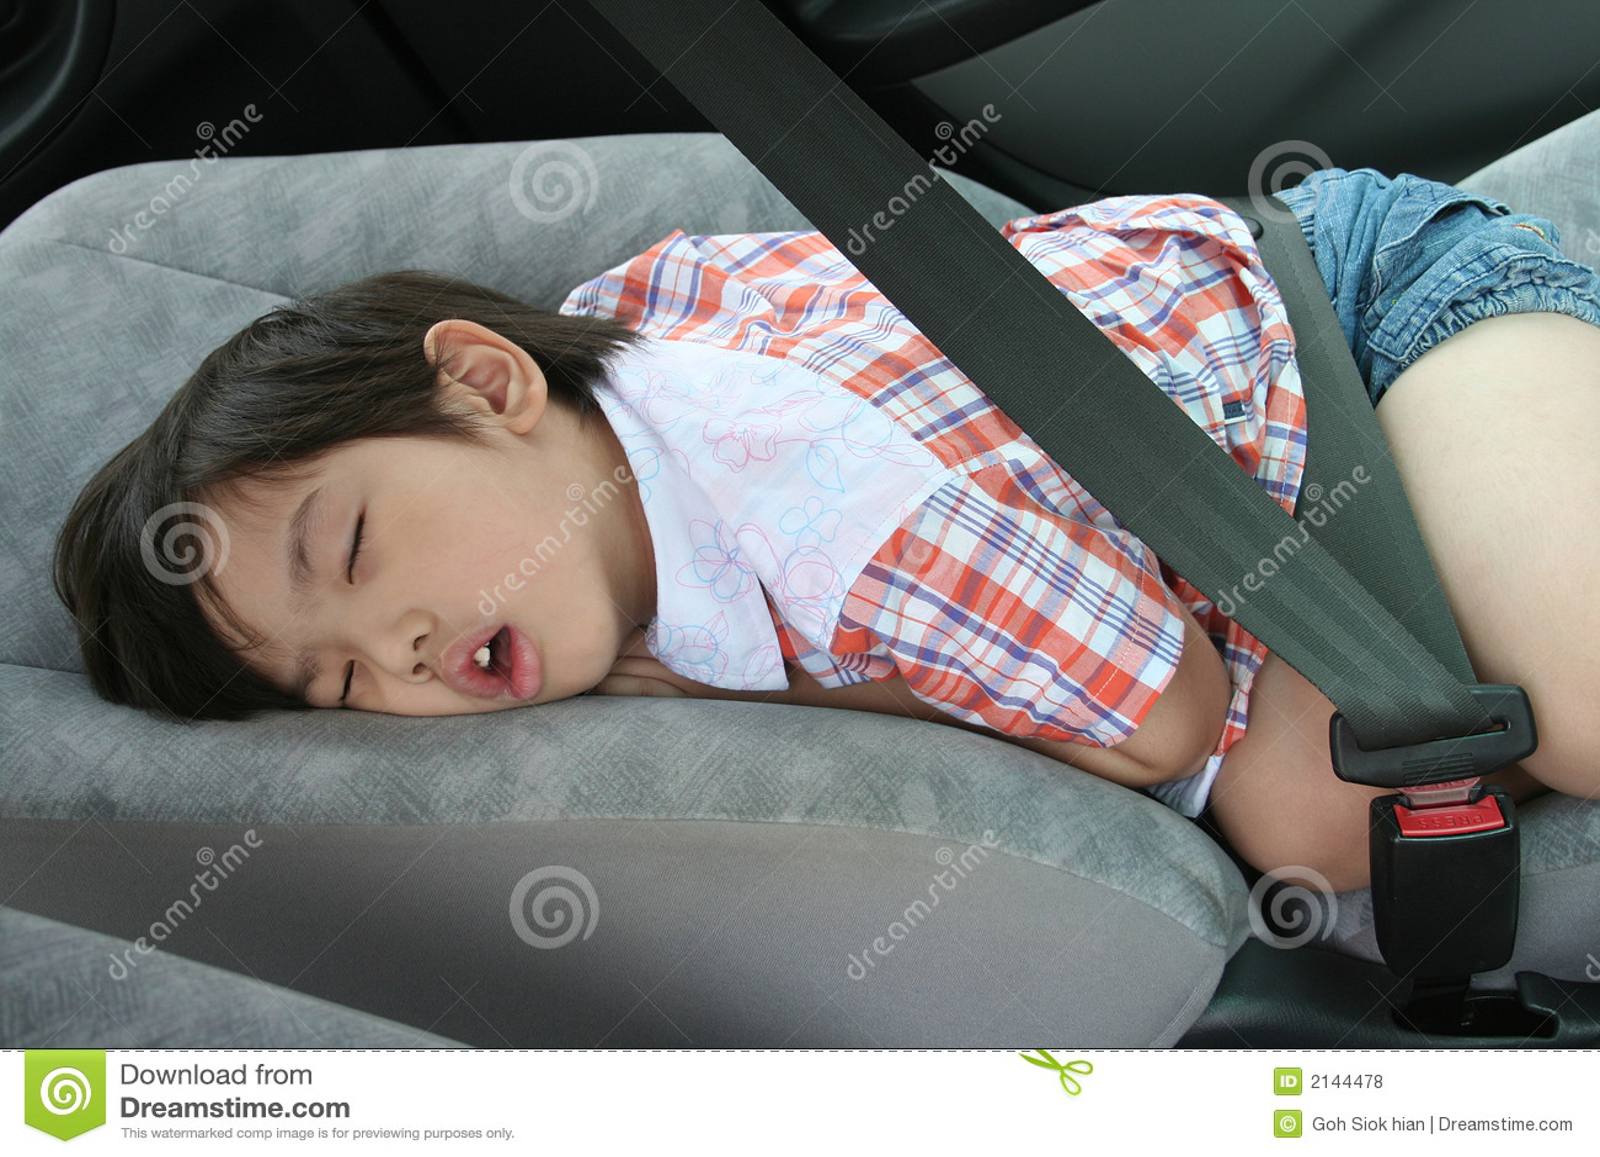 Boy Fasten Seat Belt Sleeping Royalty Free Stock Photos